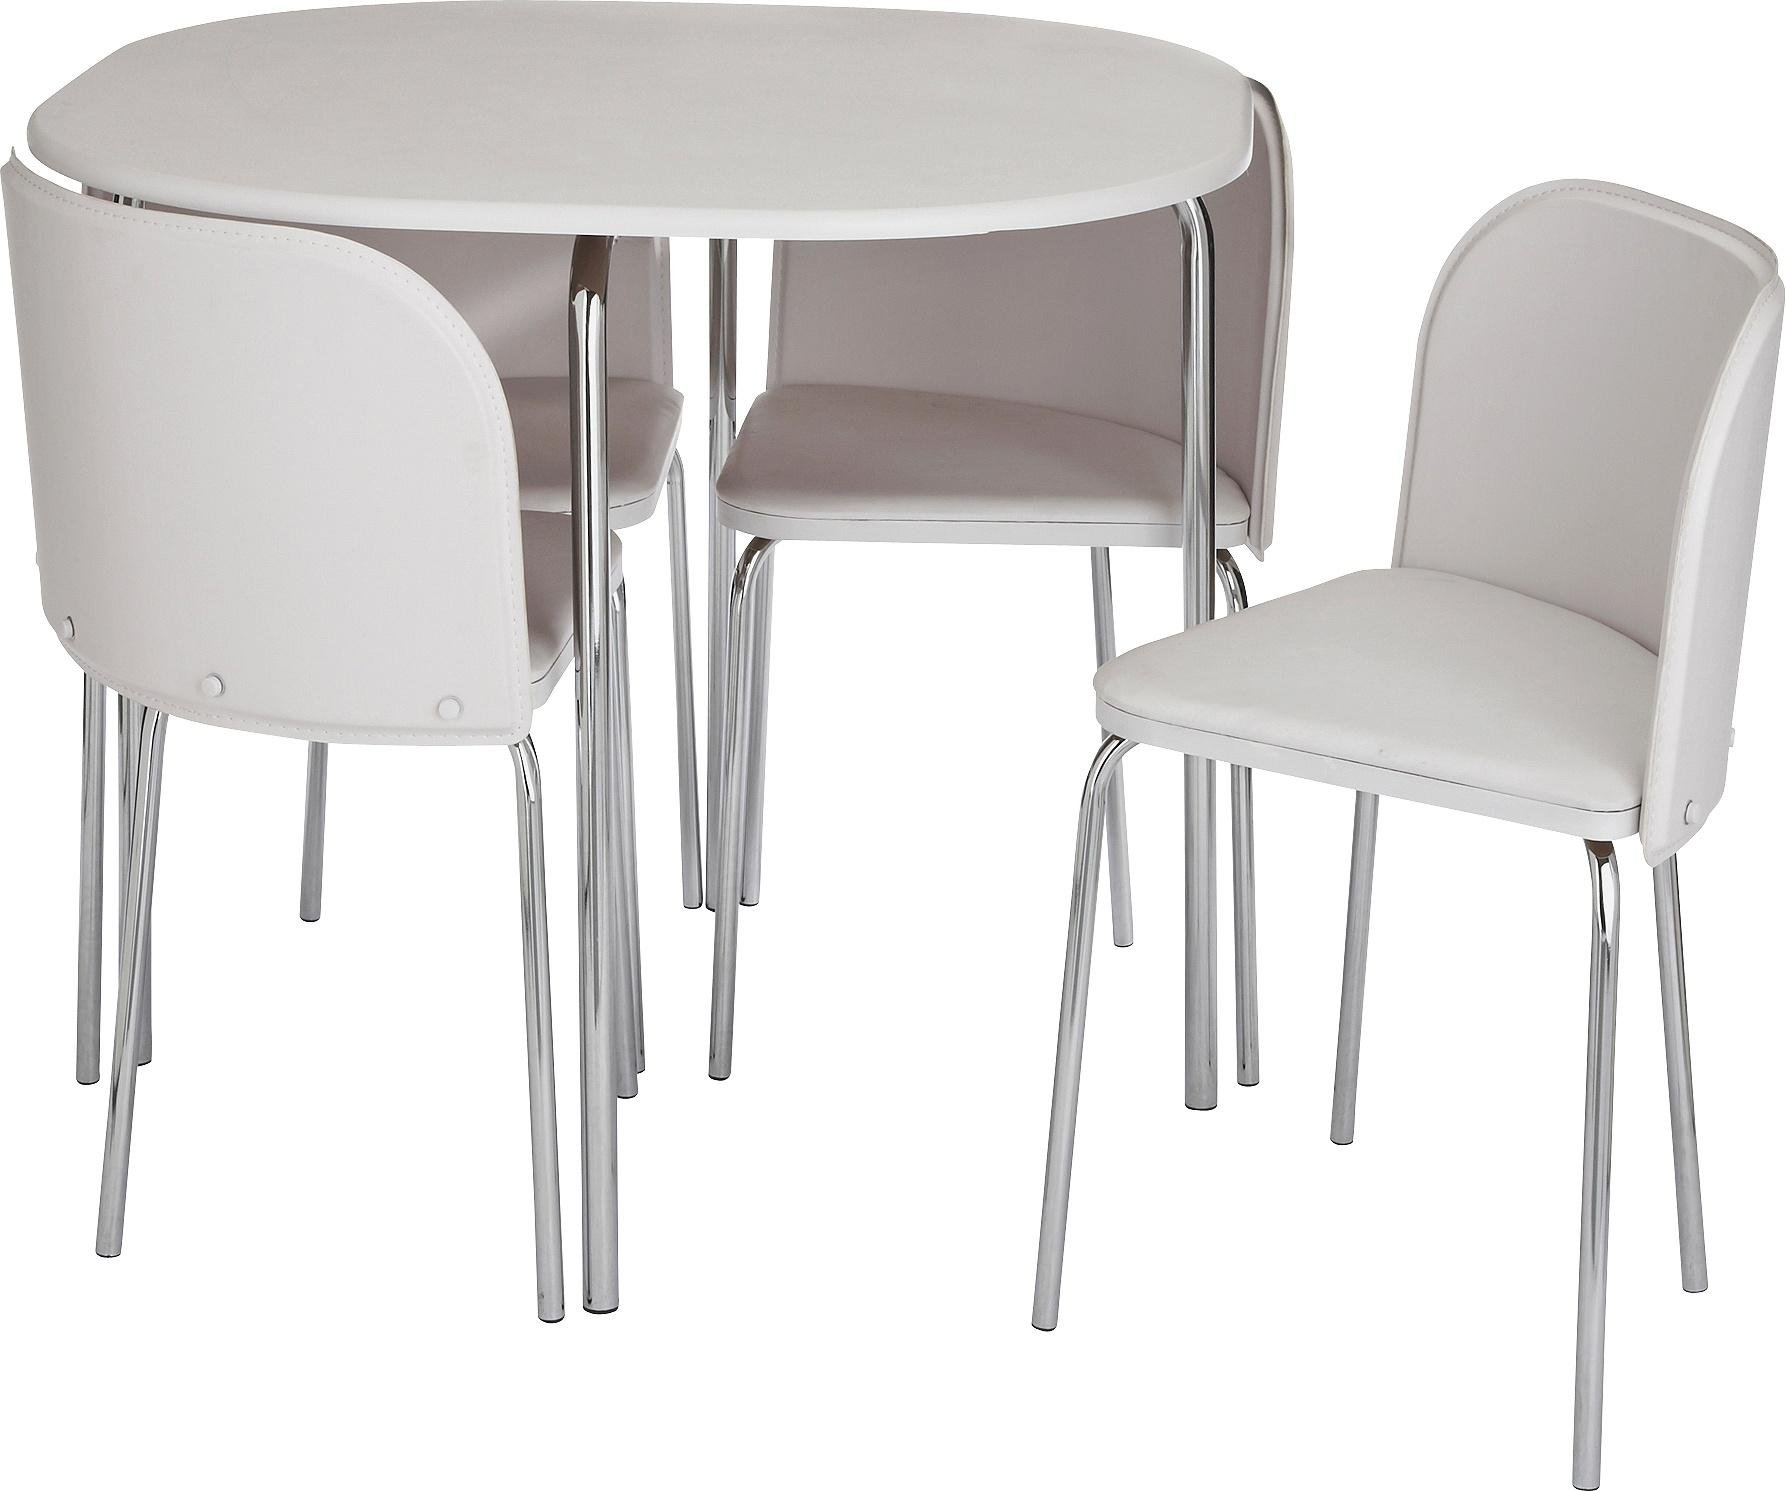 Buy Hygena Amparo Dining Table 4 Chairs White at Argoscouk